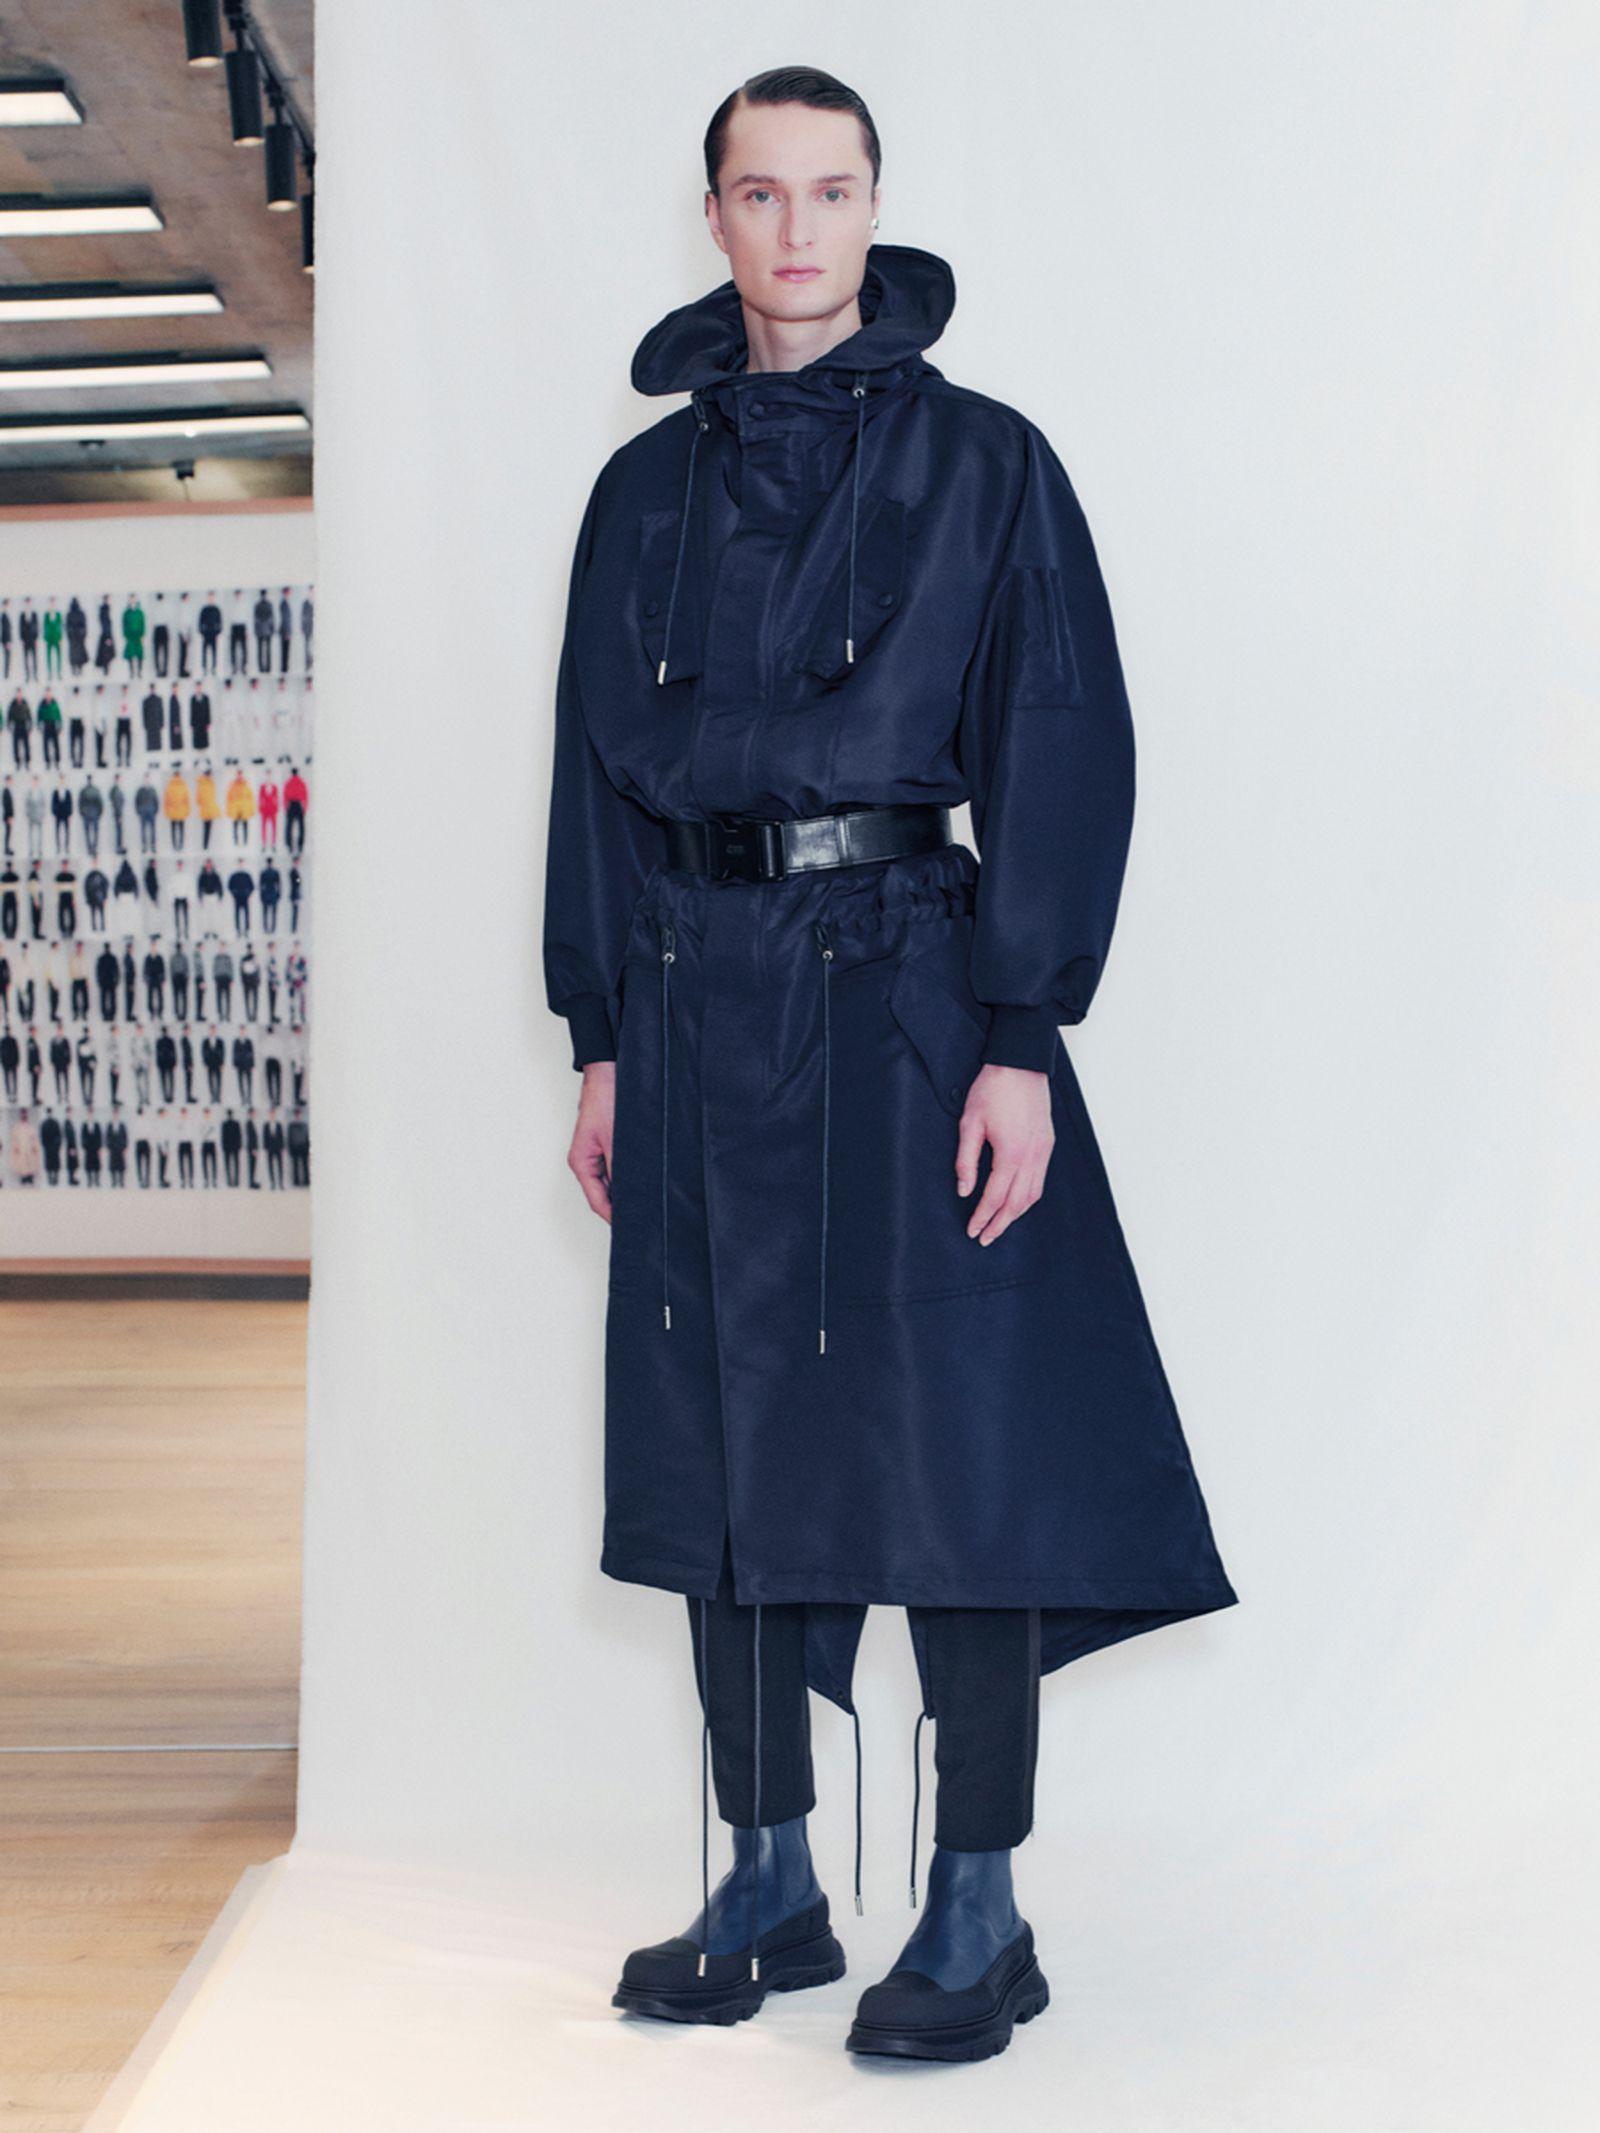 alexander-mcqueen-fall-winter-2021-collection- (11)